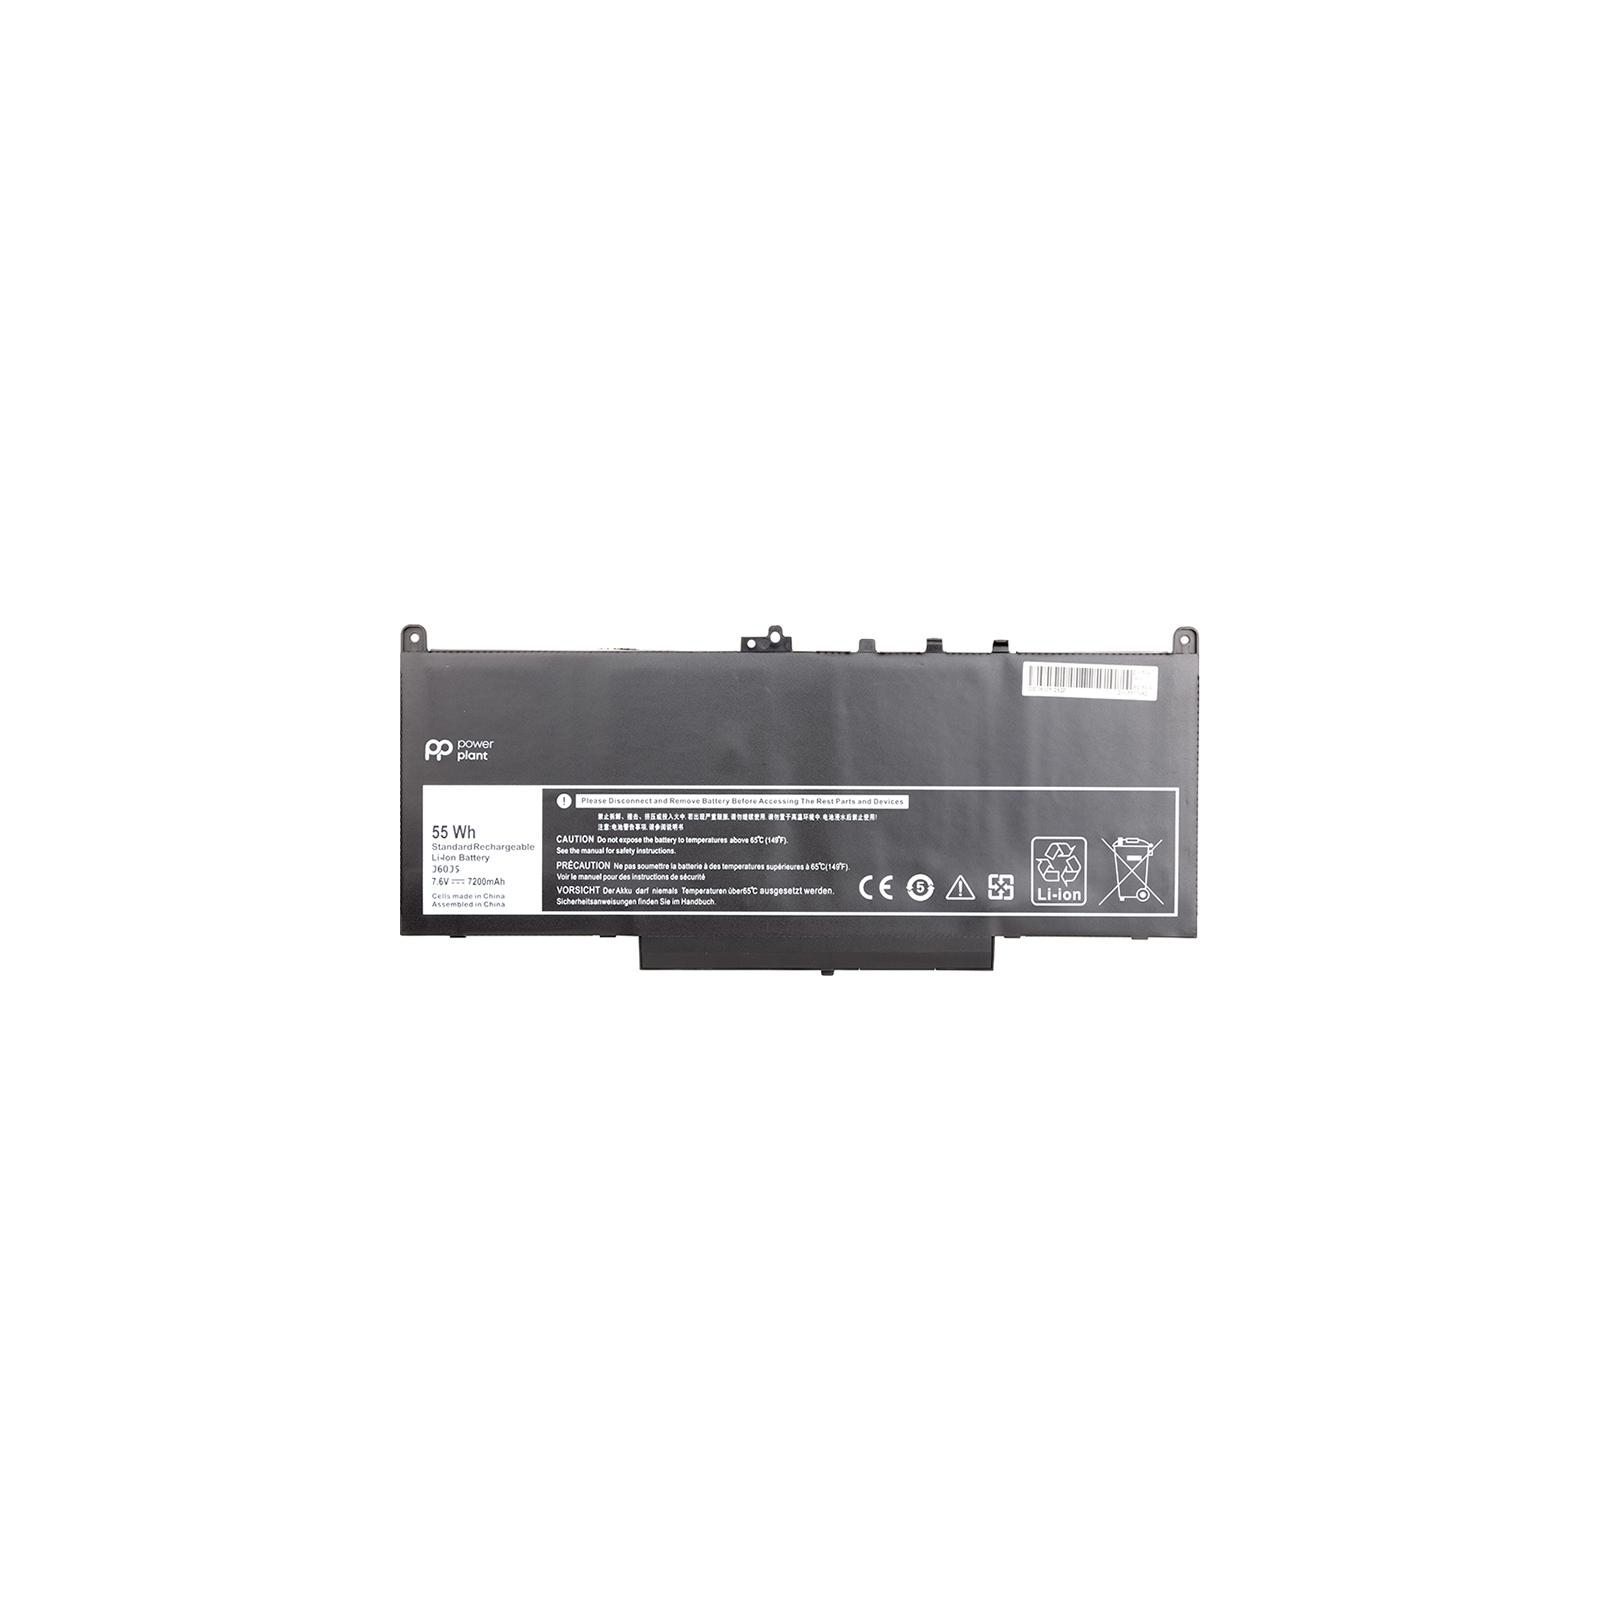 Аккумулятор для ноутбука DELL Latitude E7270 (J60J5) 7.6V 7200mAh PowerPlant (NB441143)